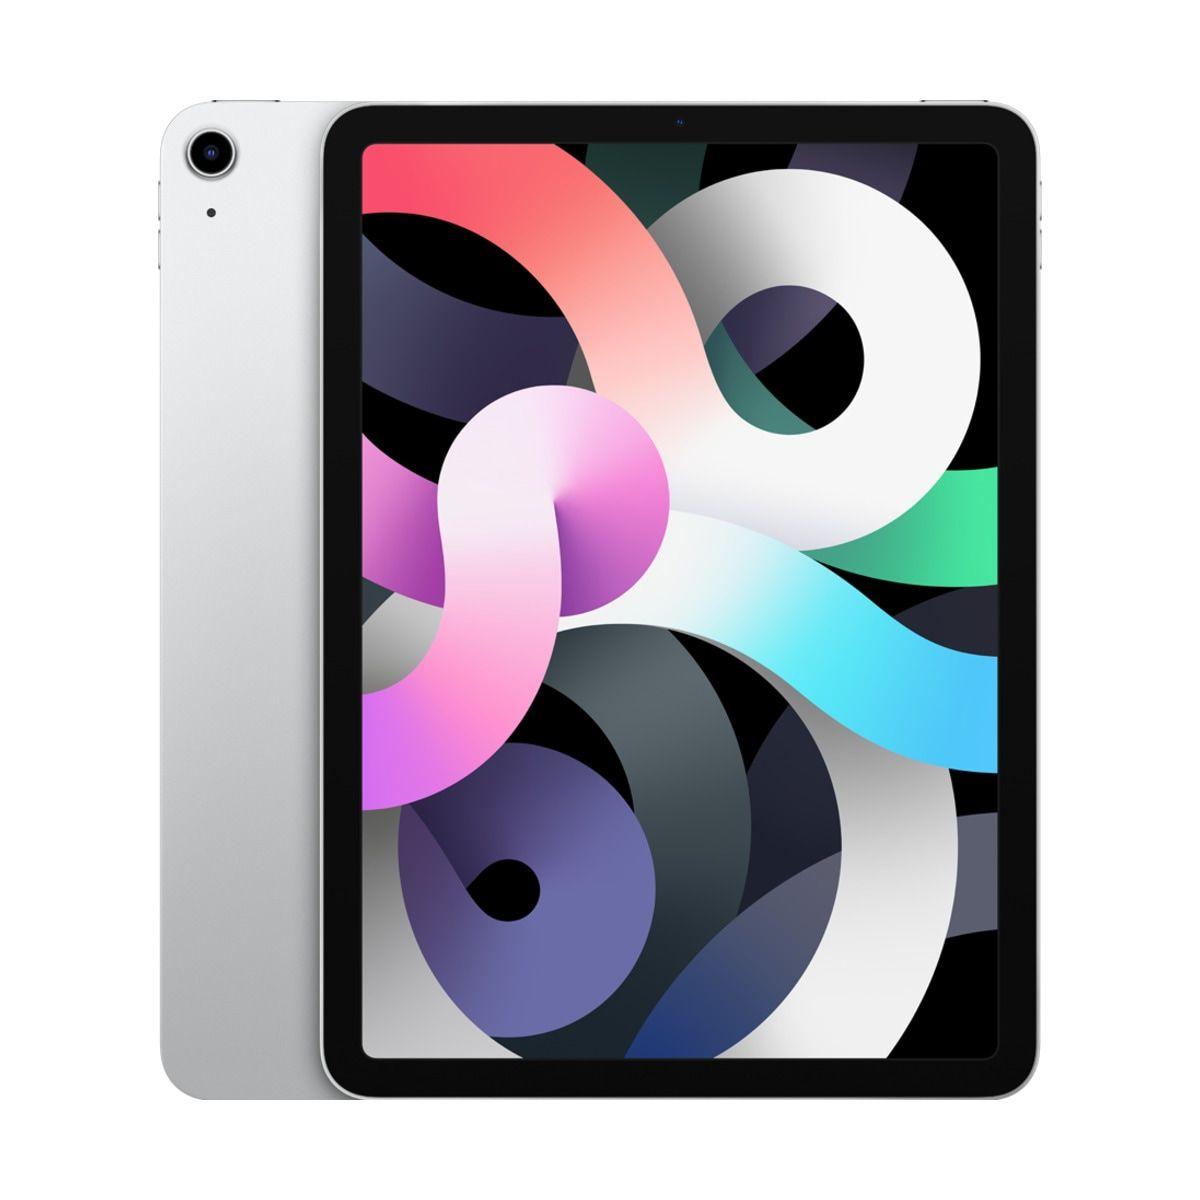 Apple iPad Air Wi-Fi + Cell 64GB - Silver / SK